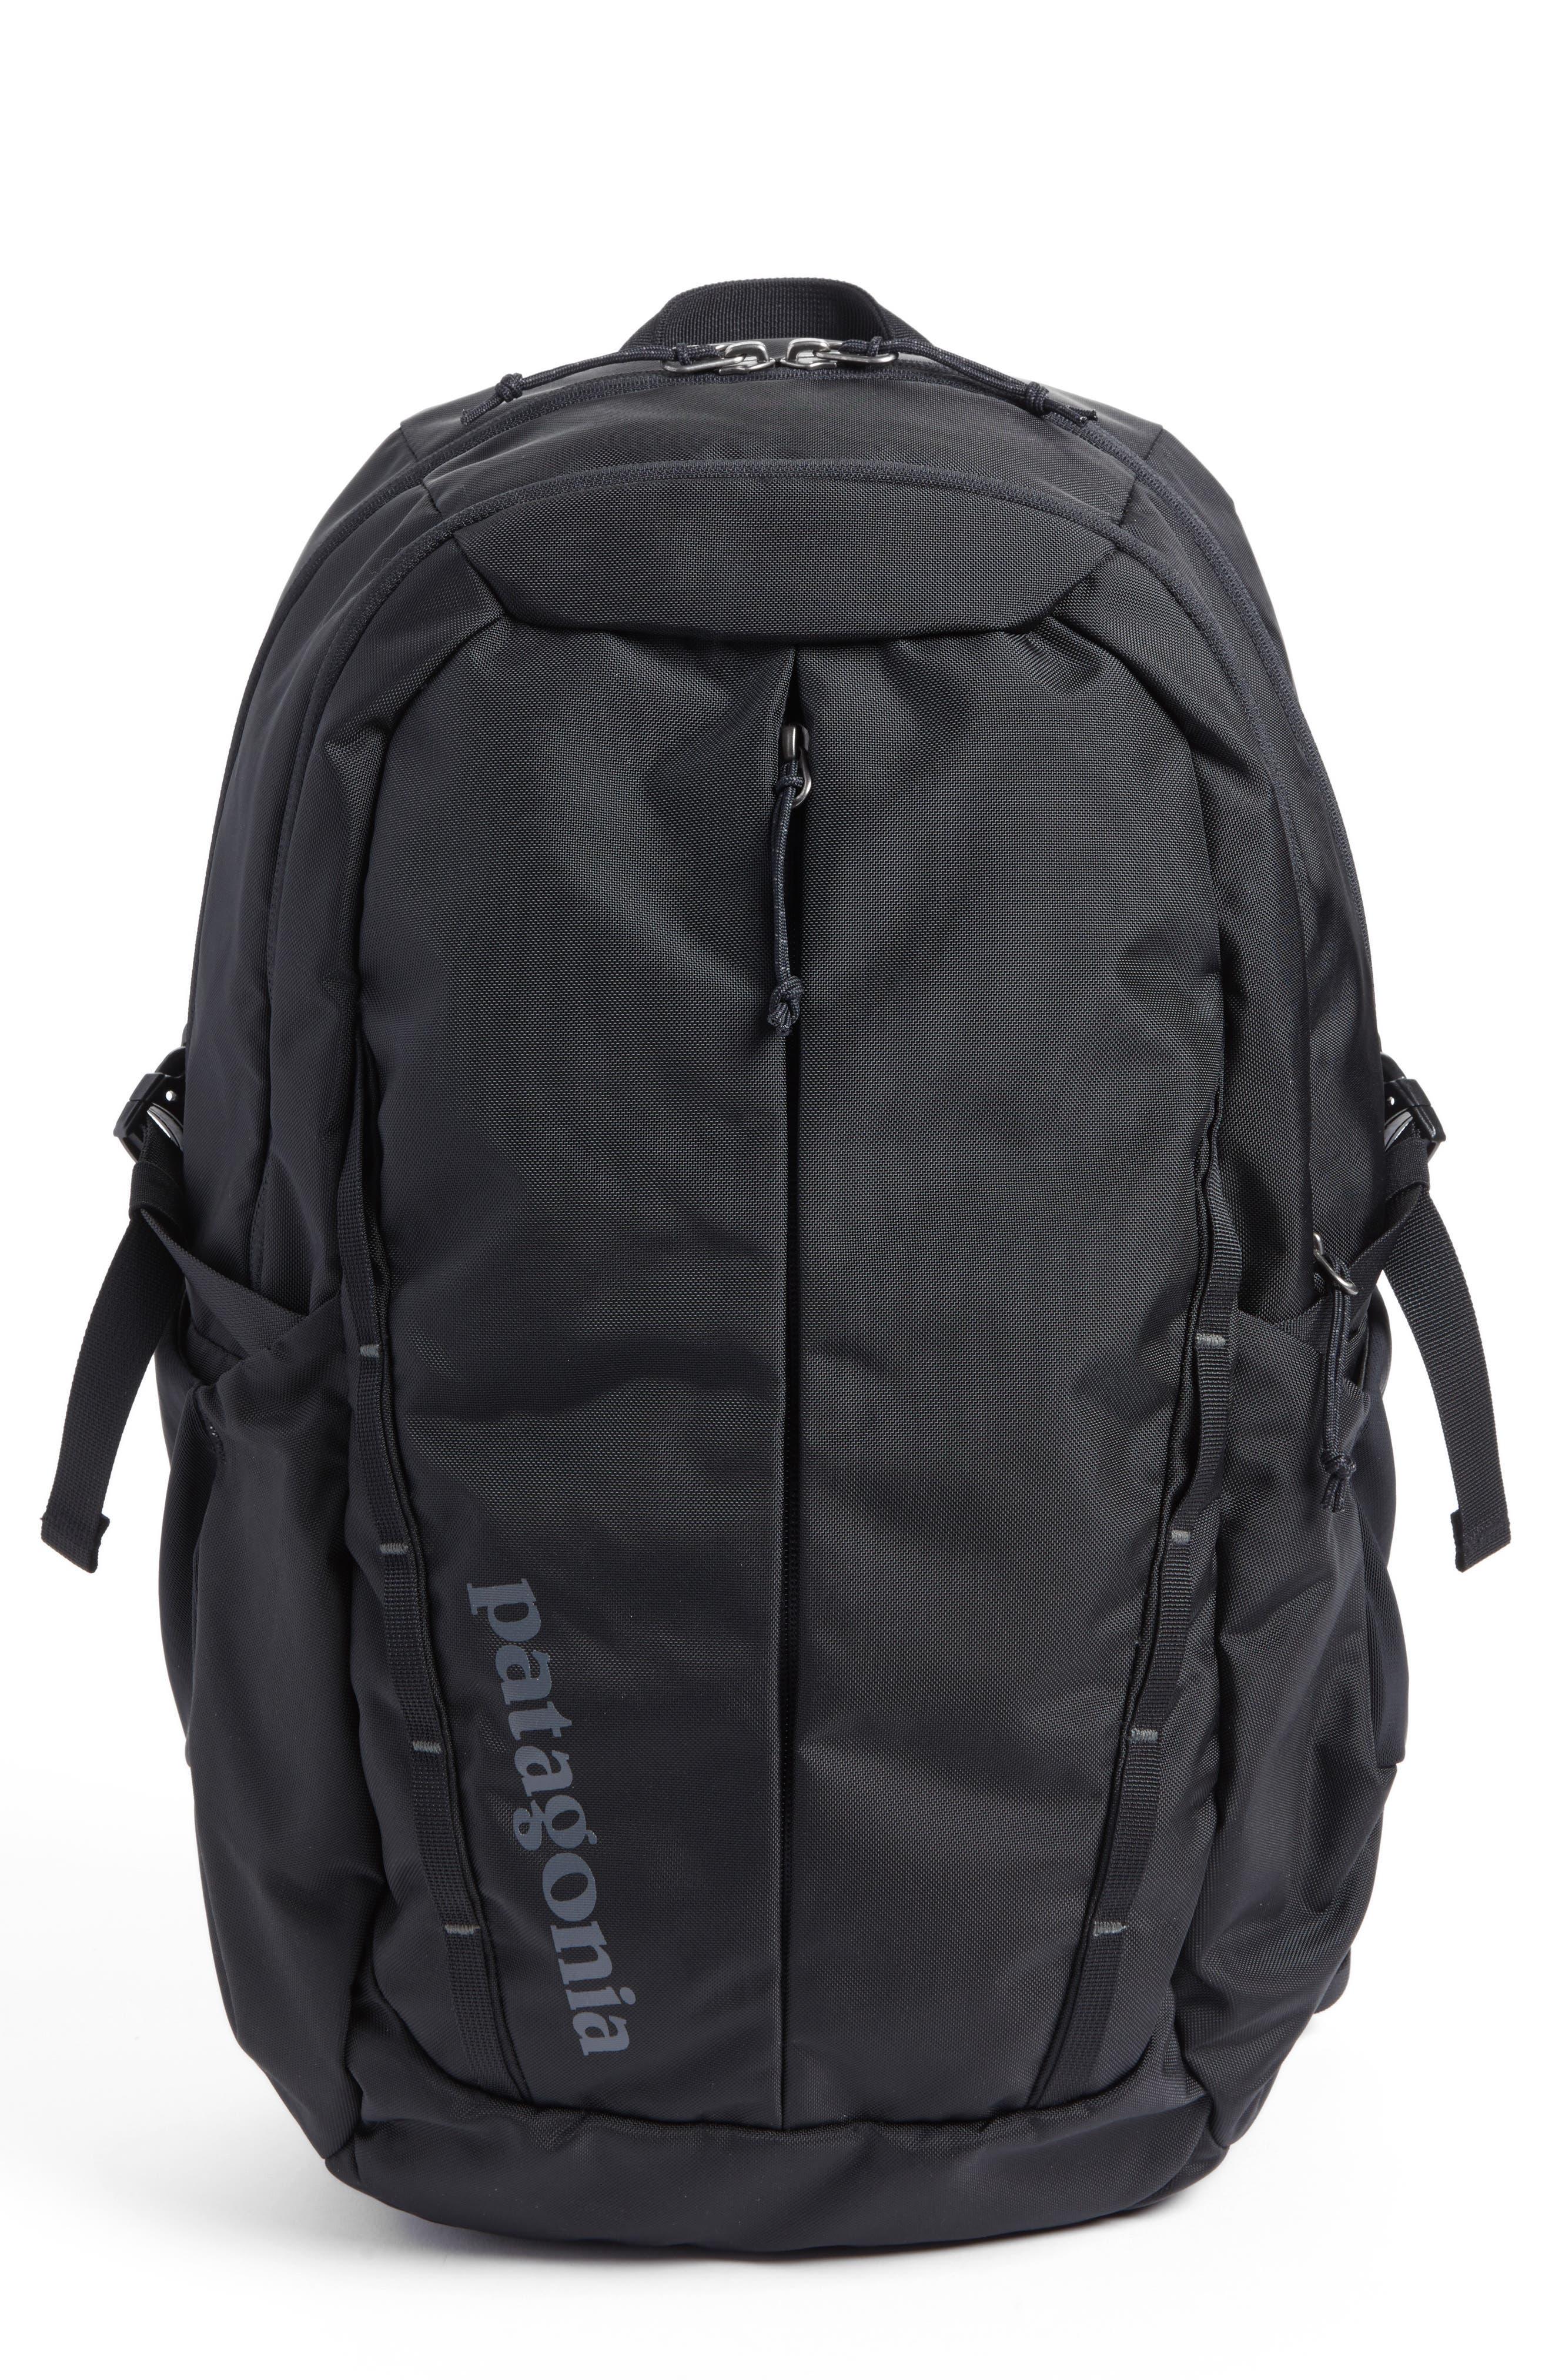 PATAGONIA, Refugio 26L Backpack, Main thumbnail 1, color, BLACK